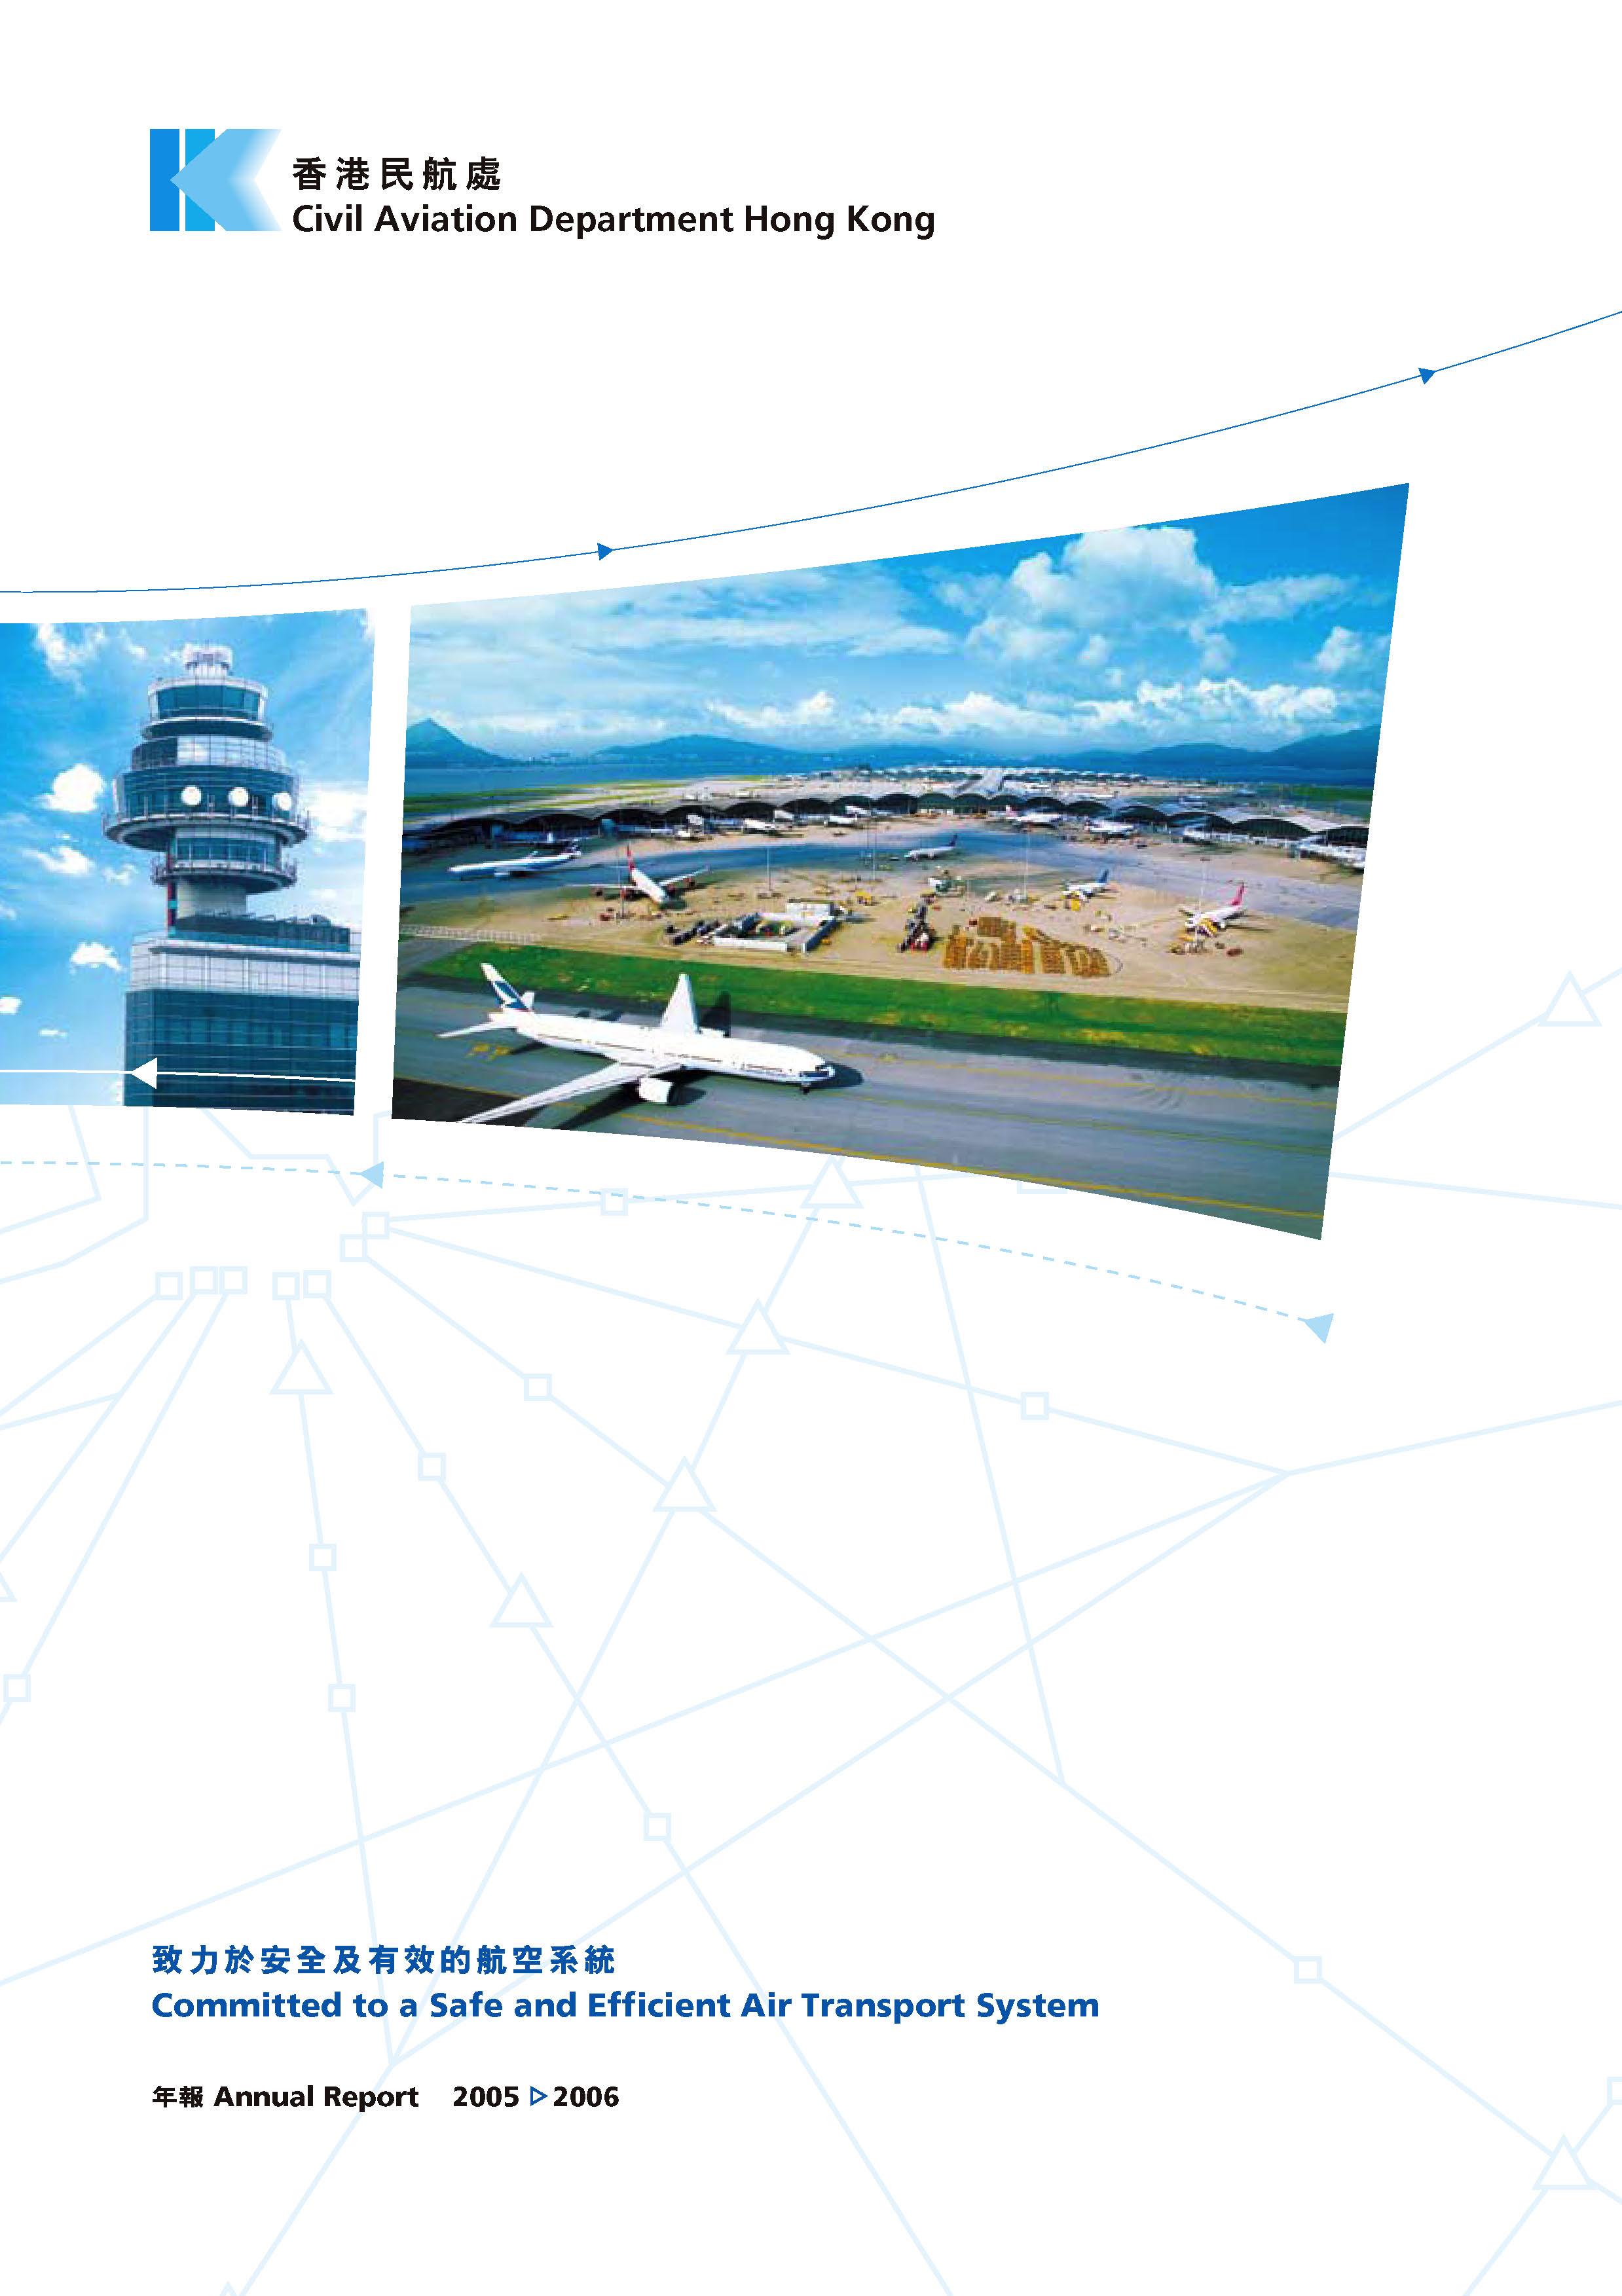 Civil Aviation Department - CAD Annual Report 2005/2006